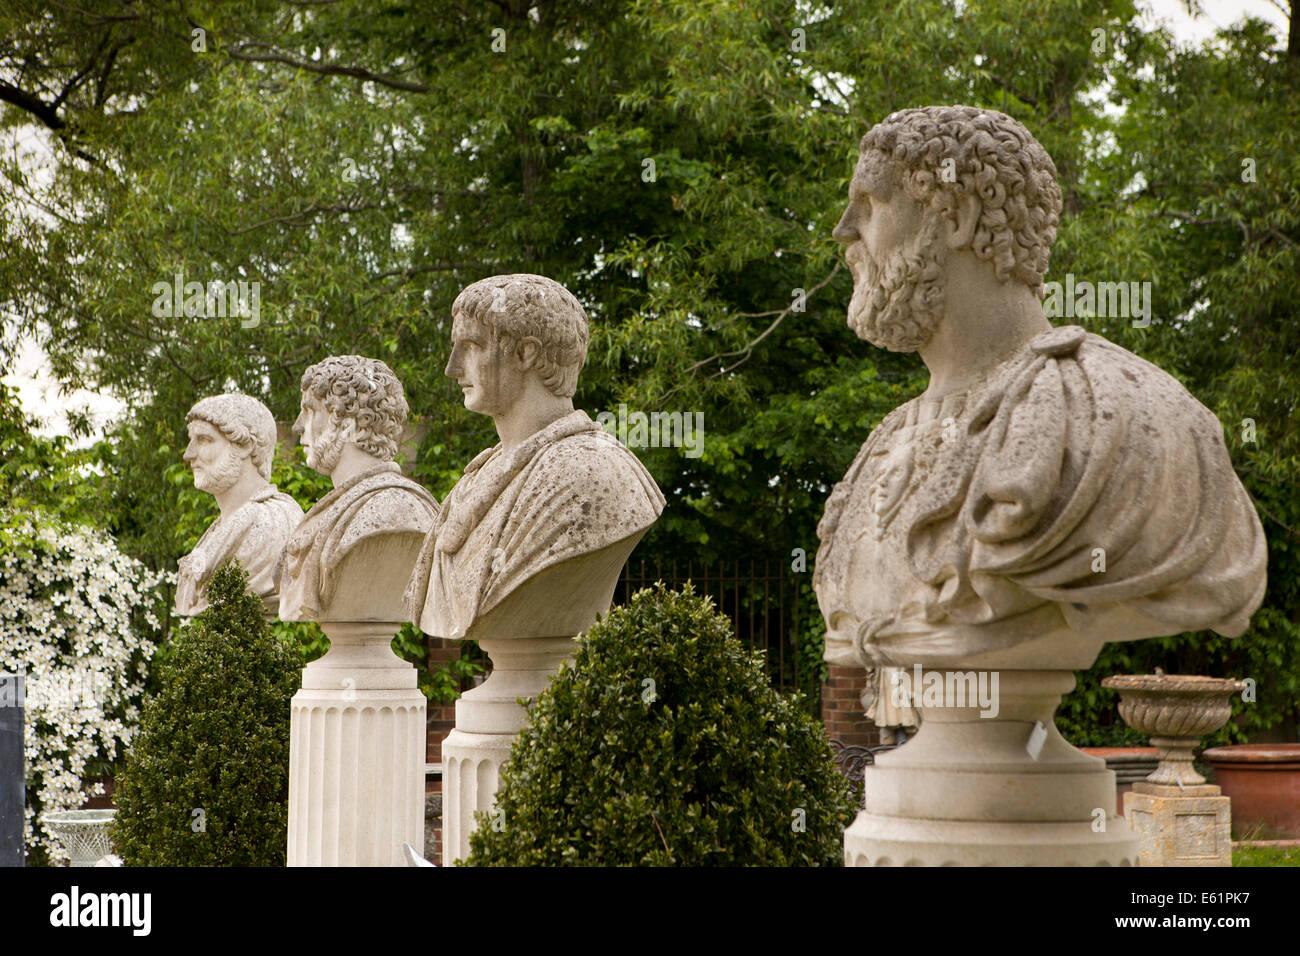 UK England, Dorset, Gillingham, Wyke, Talisman, Unusual Outdoor Garden  Ornaments,